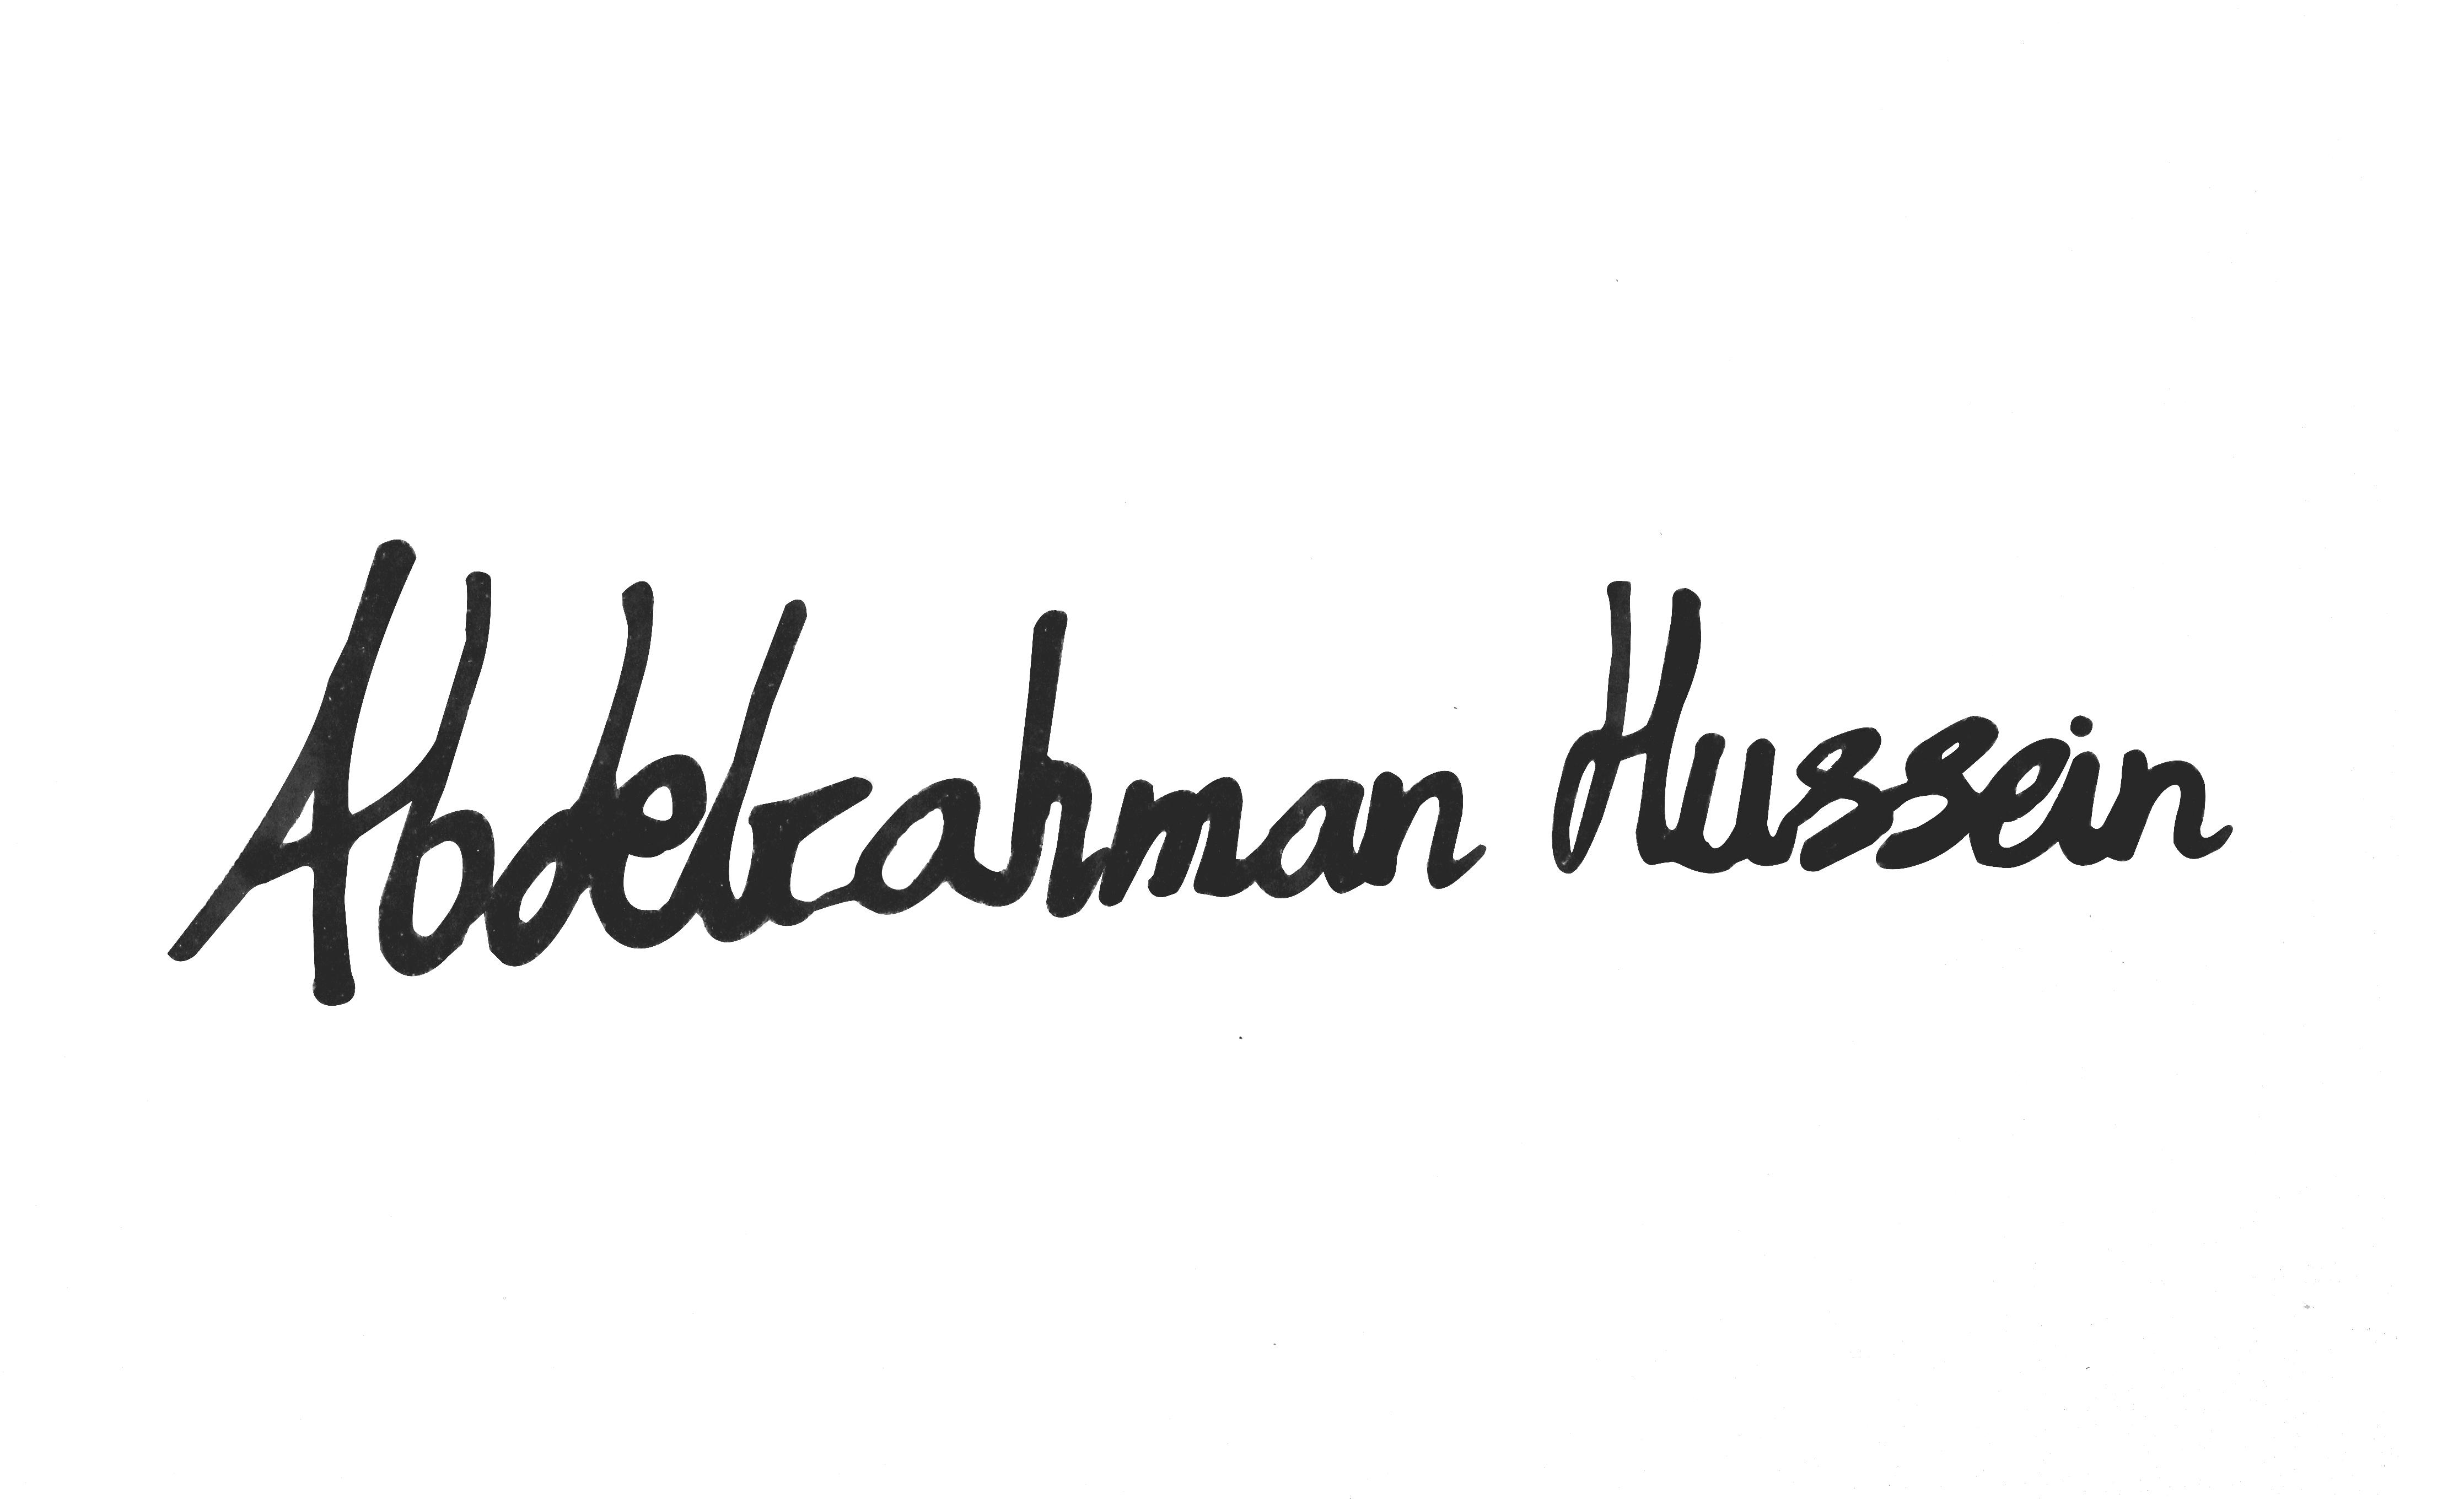 Abdelrahman Abdelazeem's Signature